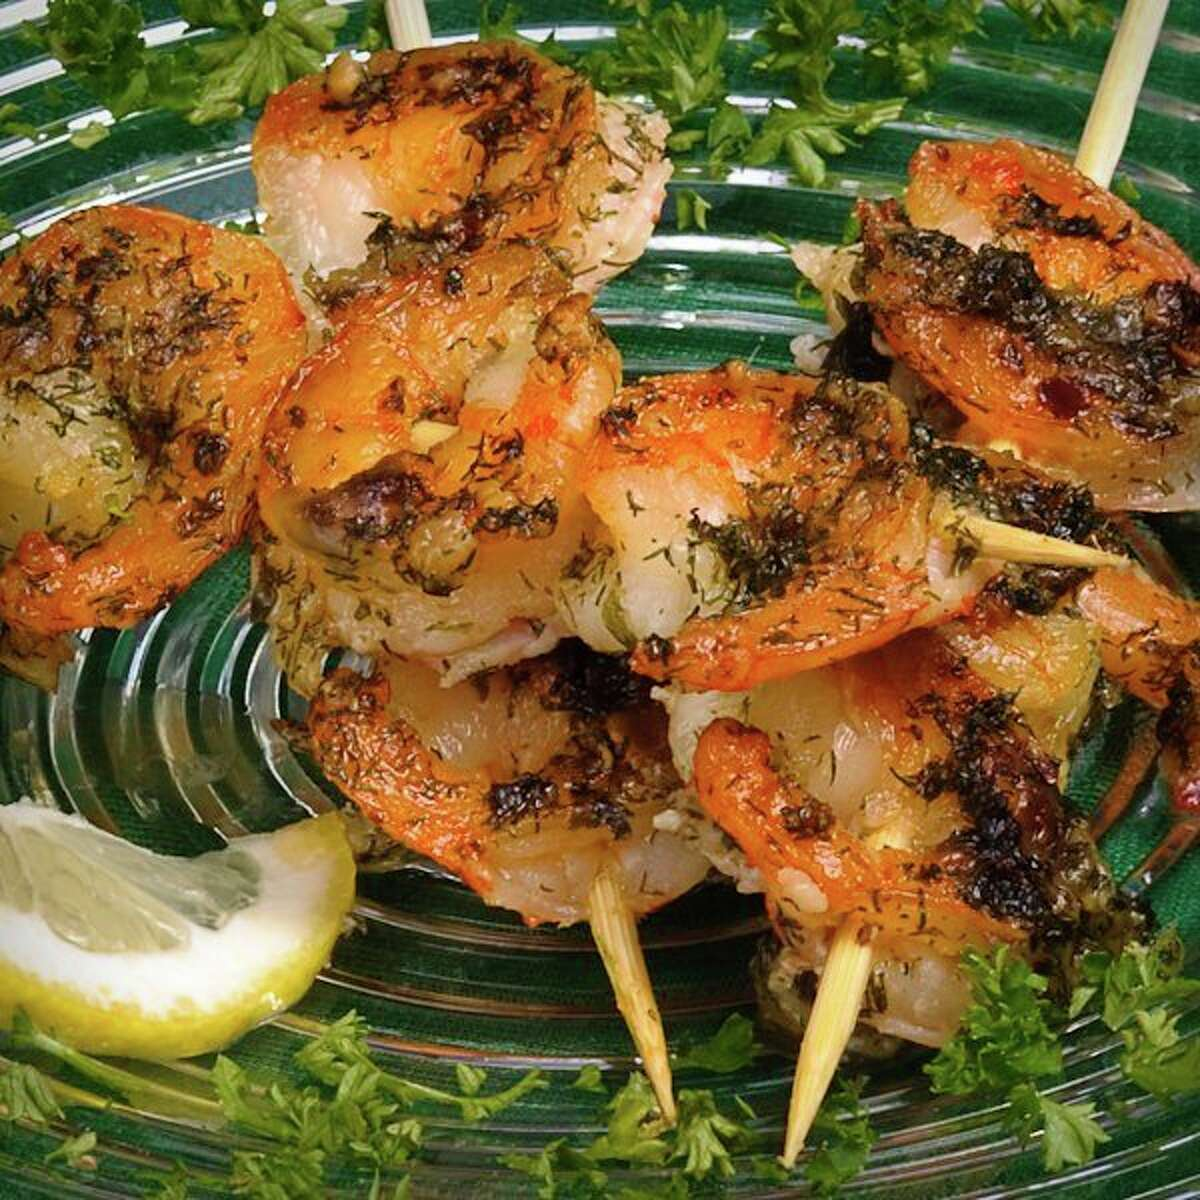 Shrimp scampi. (Photo provided/Donna Frawley)